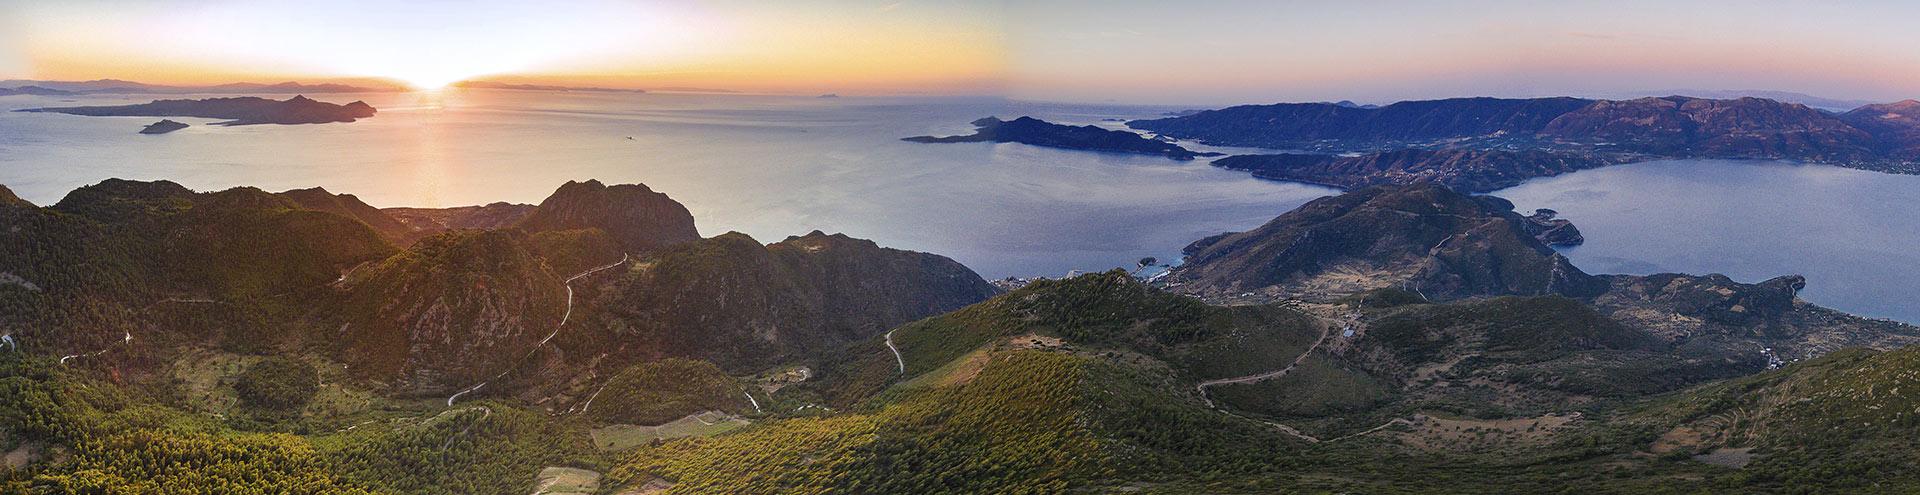 Panorama der Halbinsel Methana. (c) Tobias Schorr